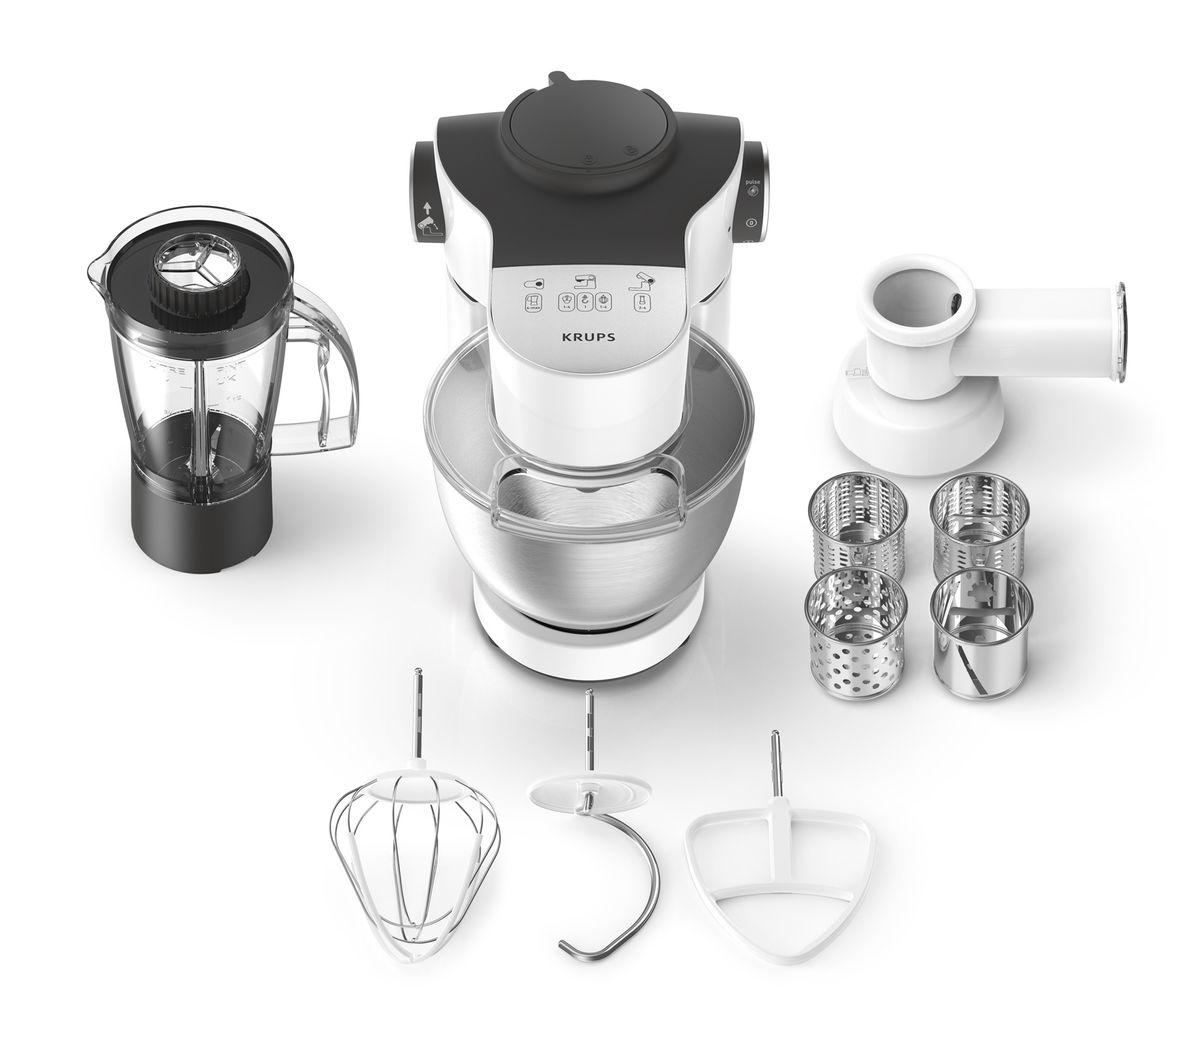 Krups KA2531 Master Perfect Plus Küchenmaschine